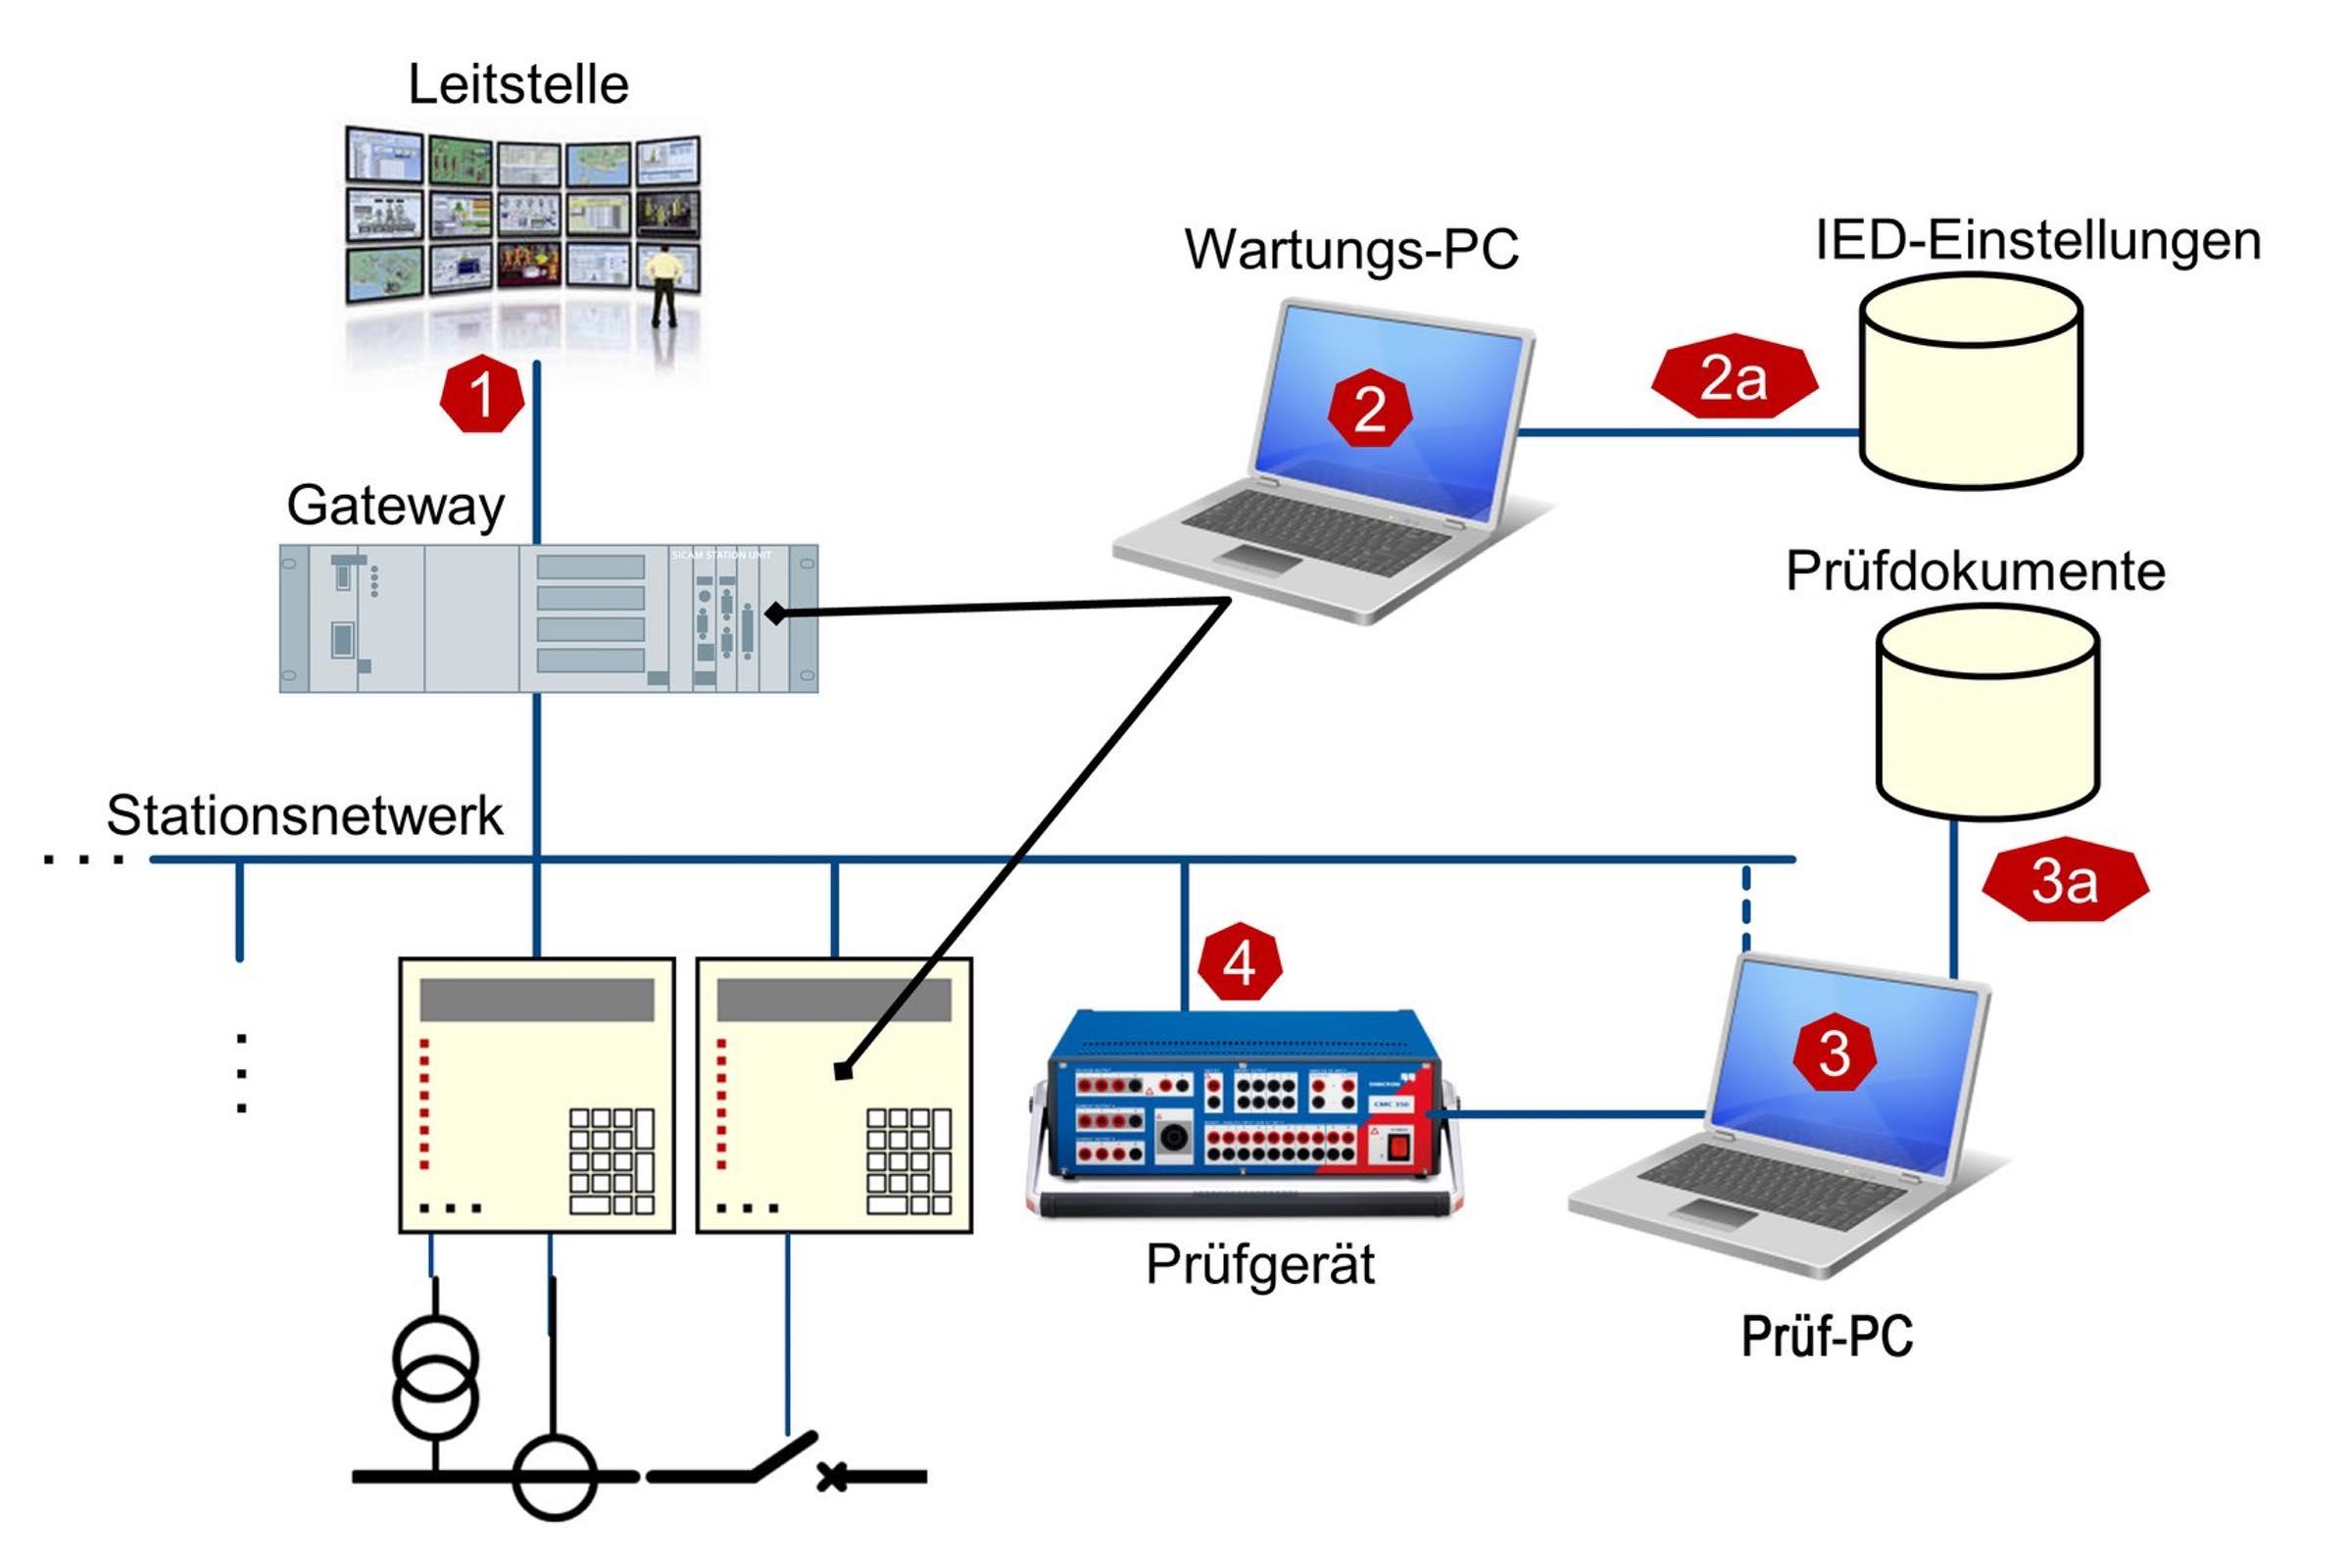 Cybersecurity, Omicron, StationGuard, Cyberangriff, Cyberangriffe, Schaltanlage, Cybersicherheit, IEC61850, IEC 61850, SCL-Koniguration,, SCL Konfiguration, schutztechnik,